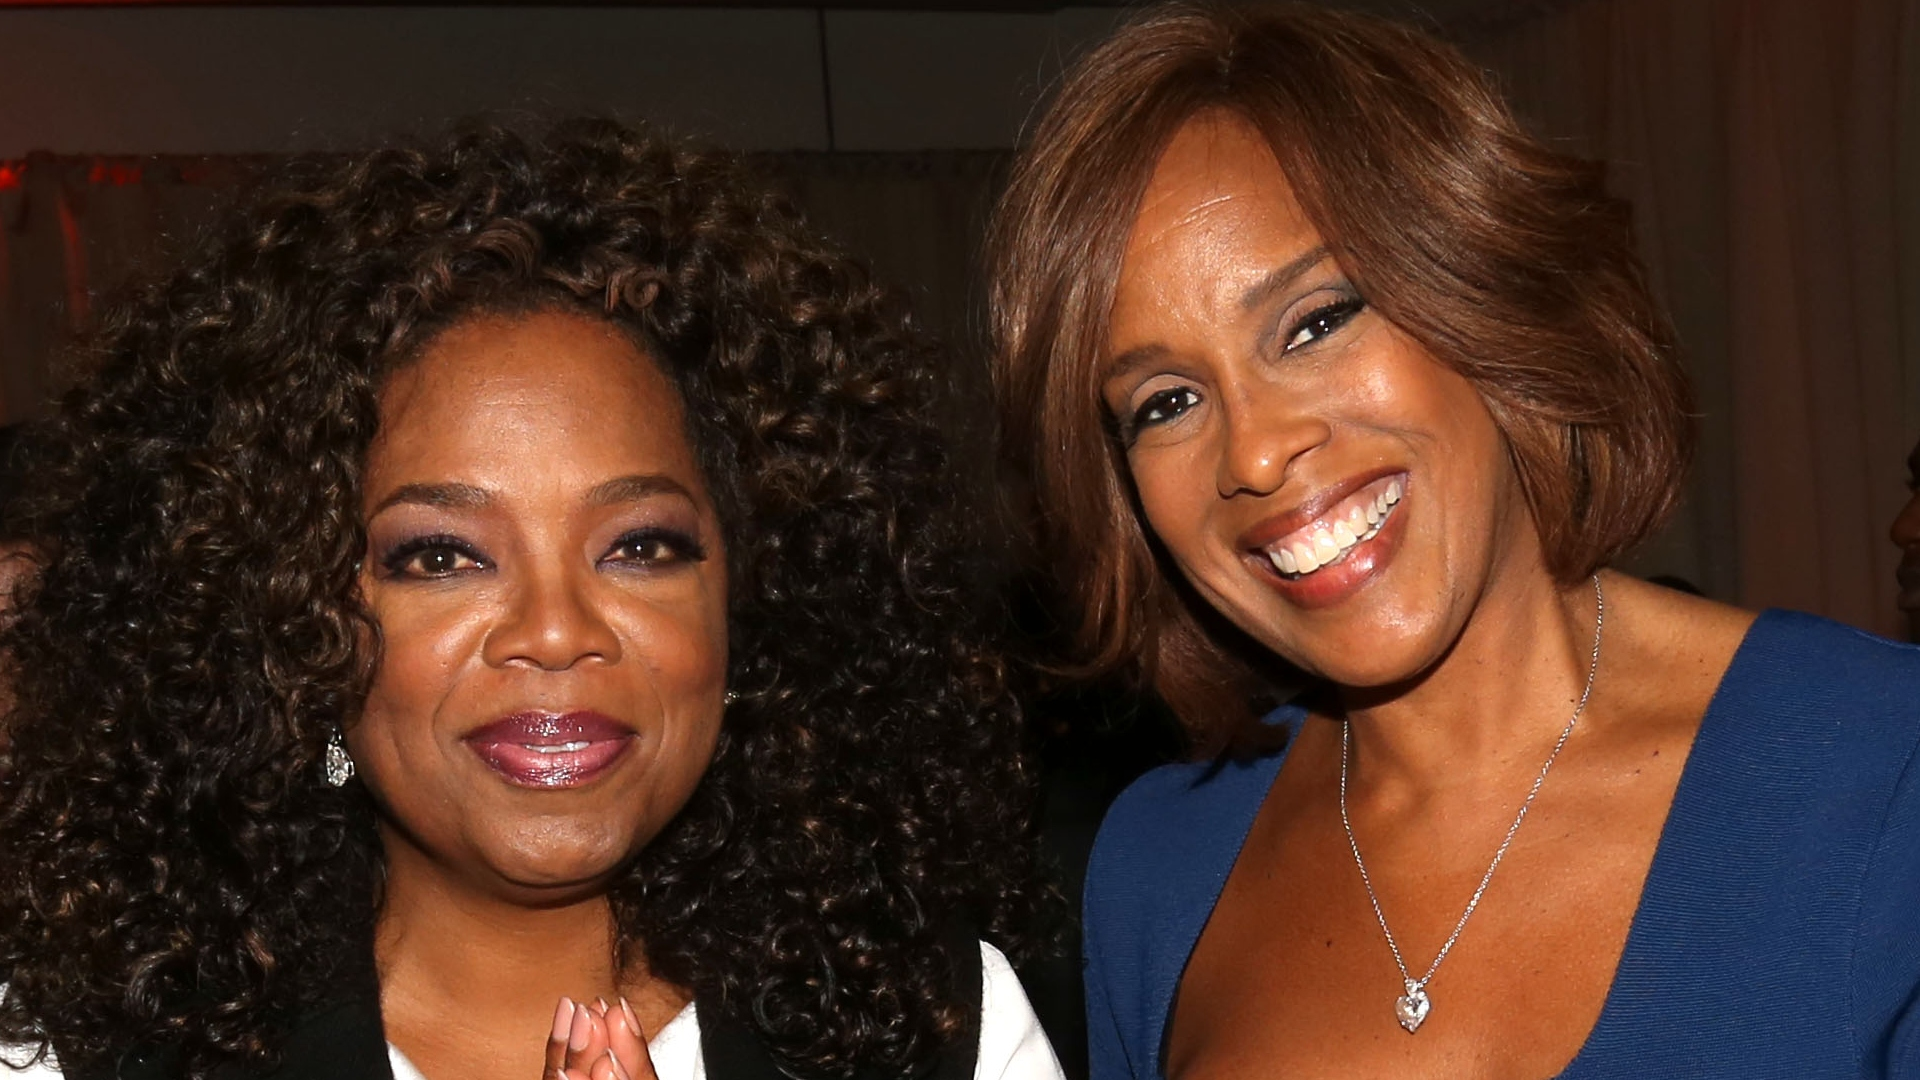 Oprah dating advice dating for older